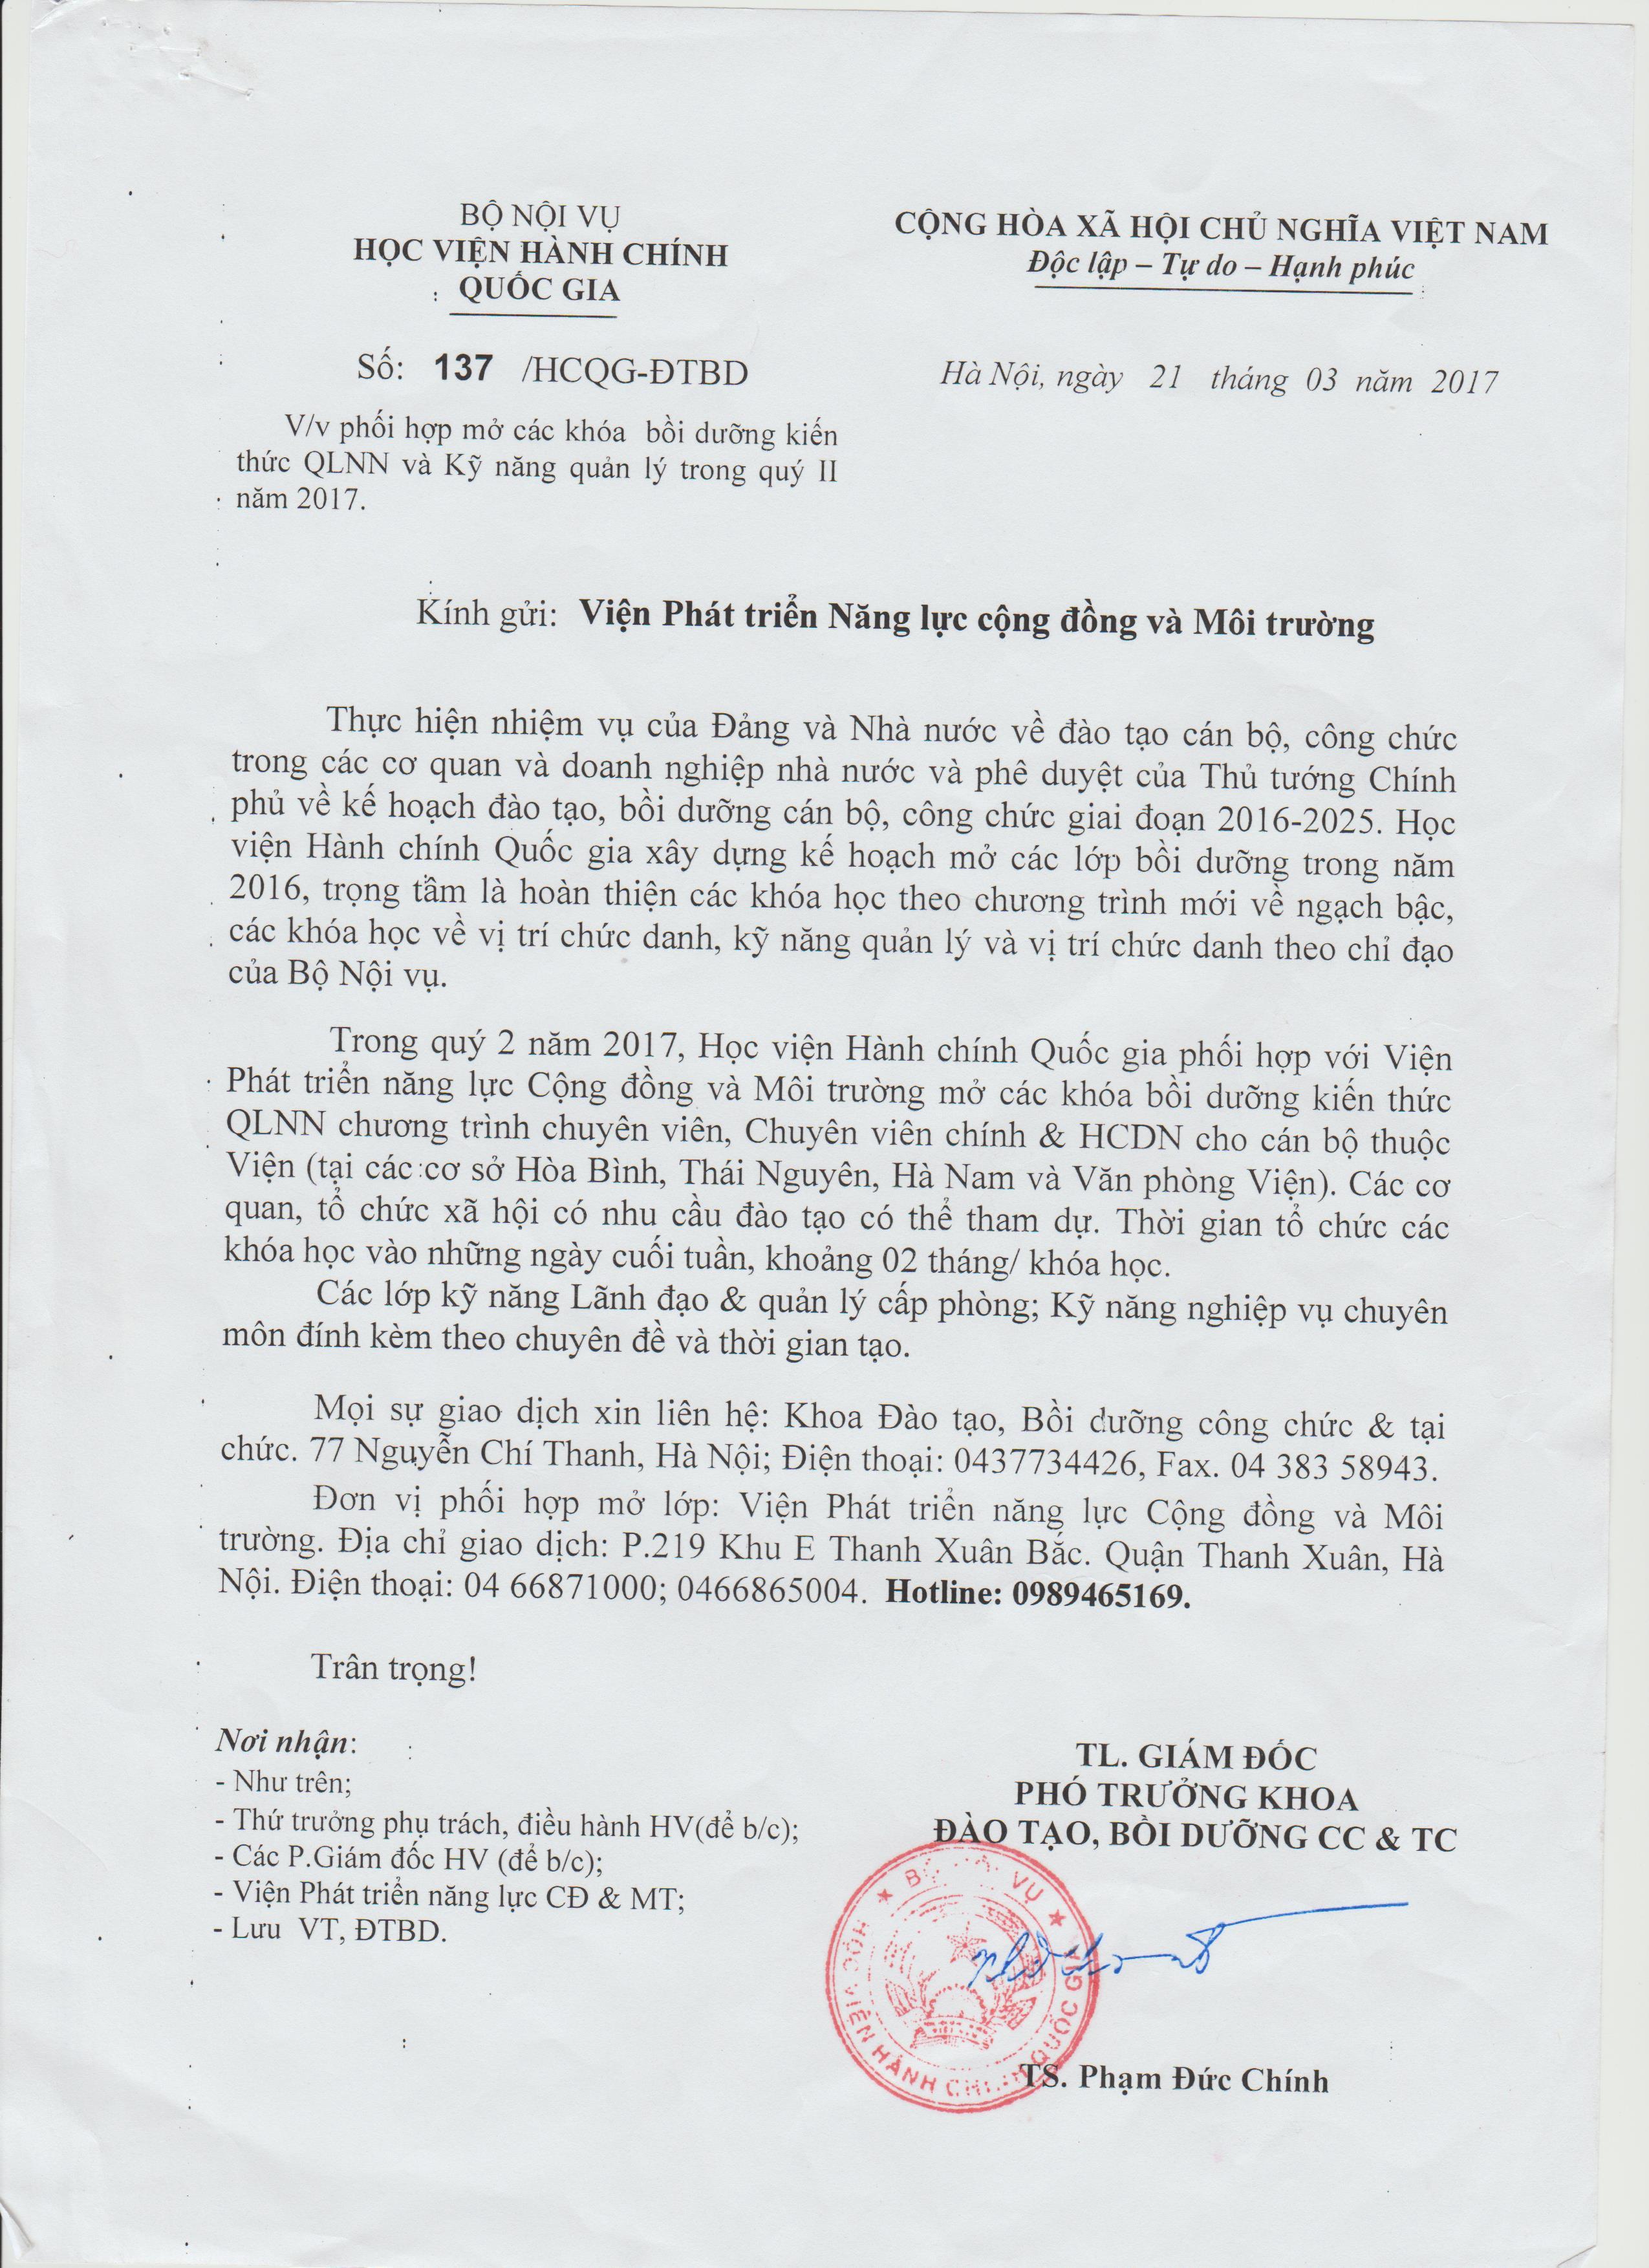 cong-van-chuyen-vien-chinh